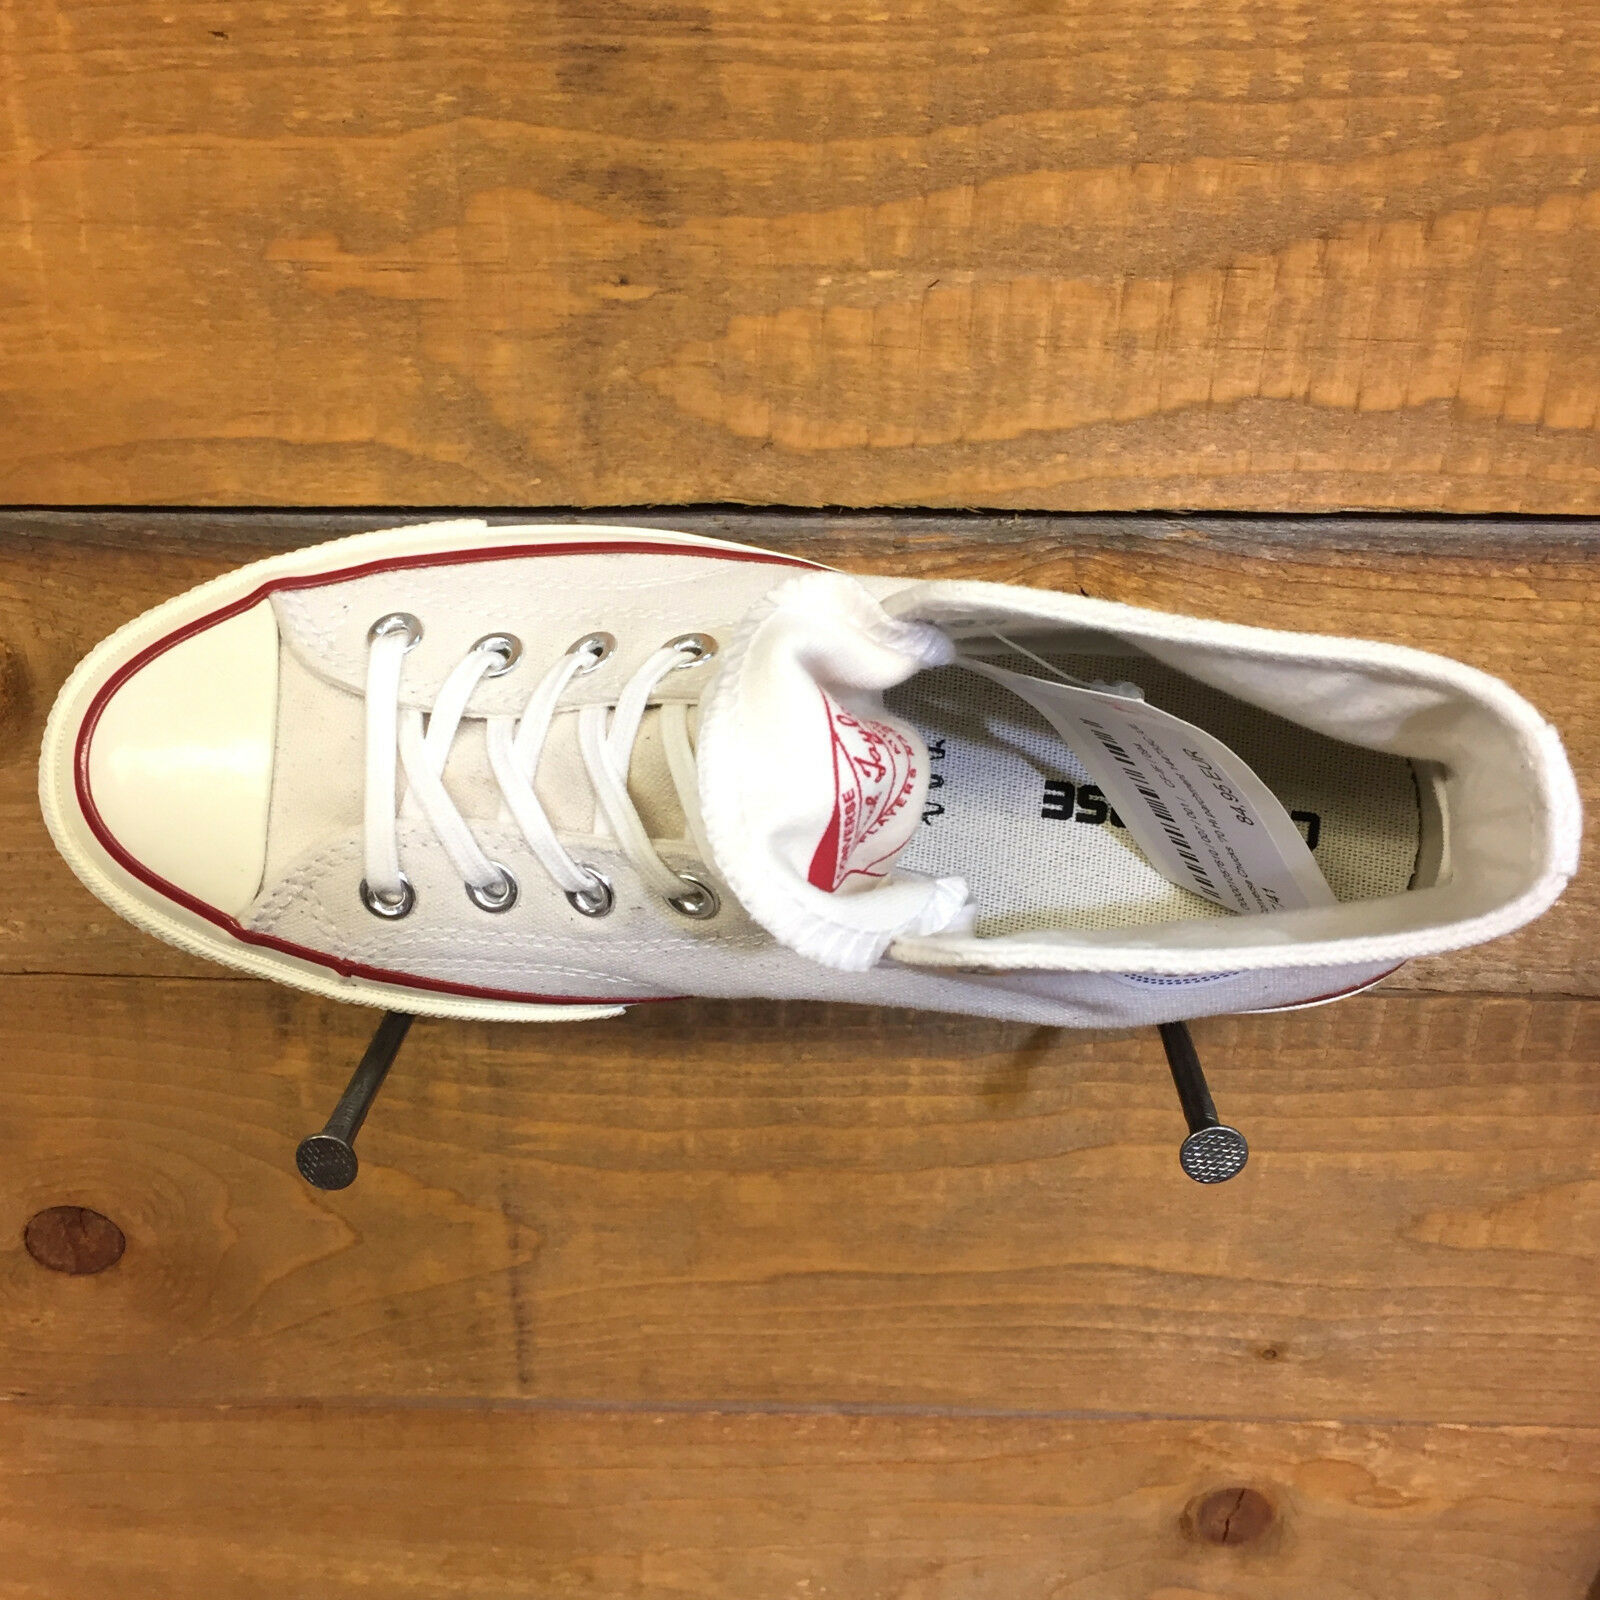 CONVERSE All Star Chucks Hi CT Schuhe 70's Schuhe CT Sneaker parchment 144755C c3d6c9